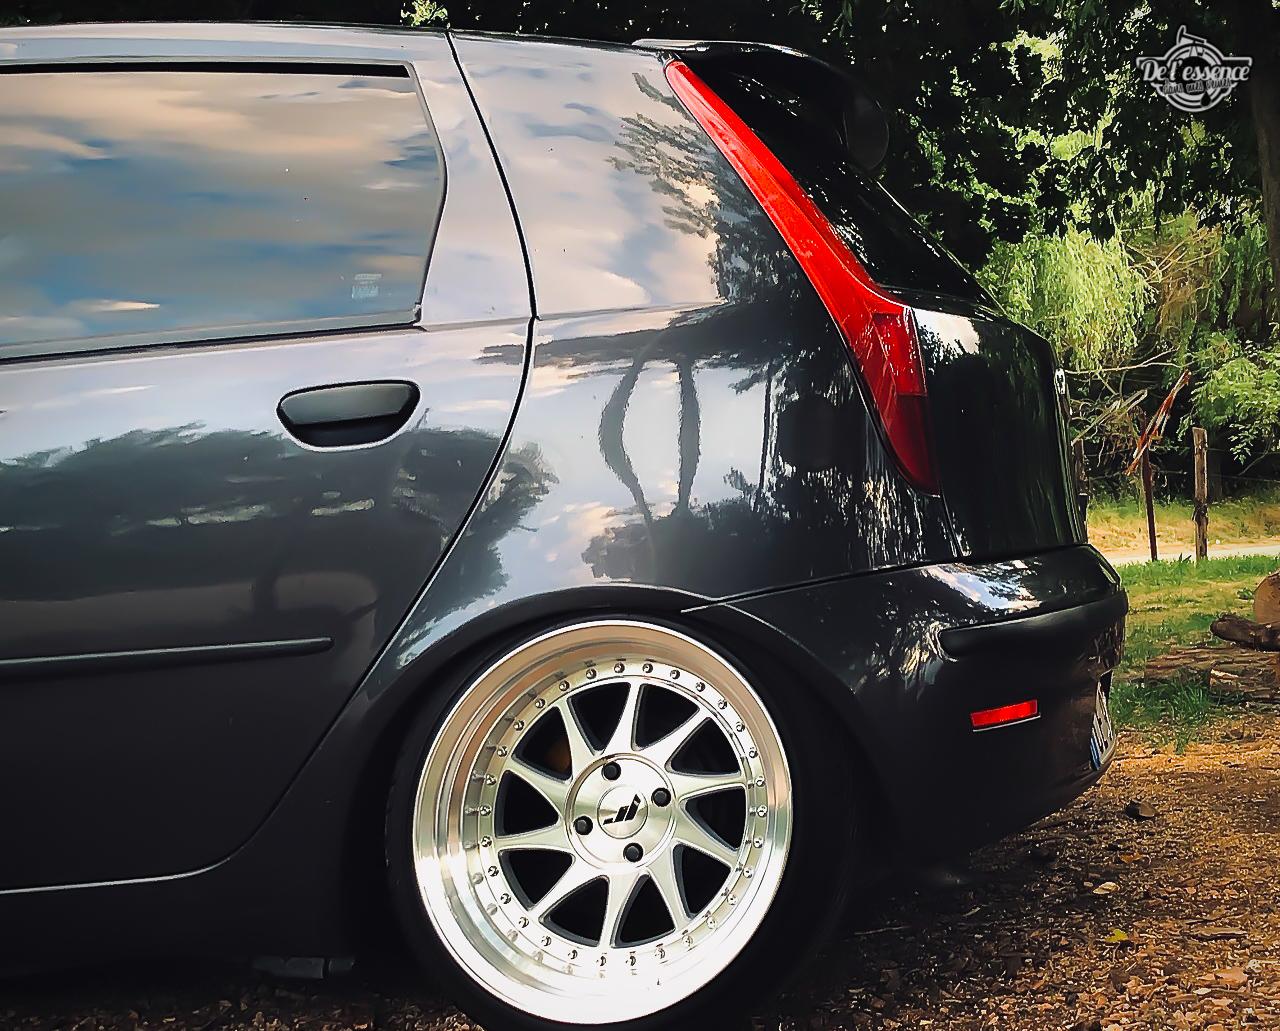 #Stance Discount - Buccaccio Gang #2 - Fiat Punto II 7